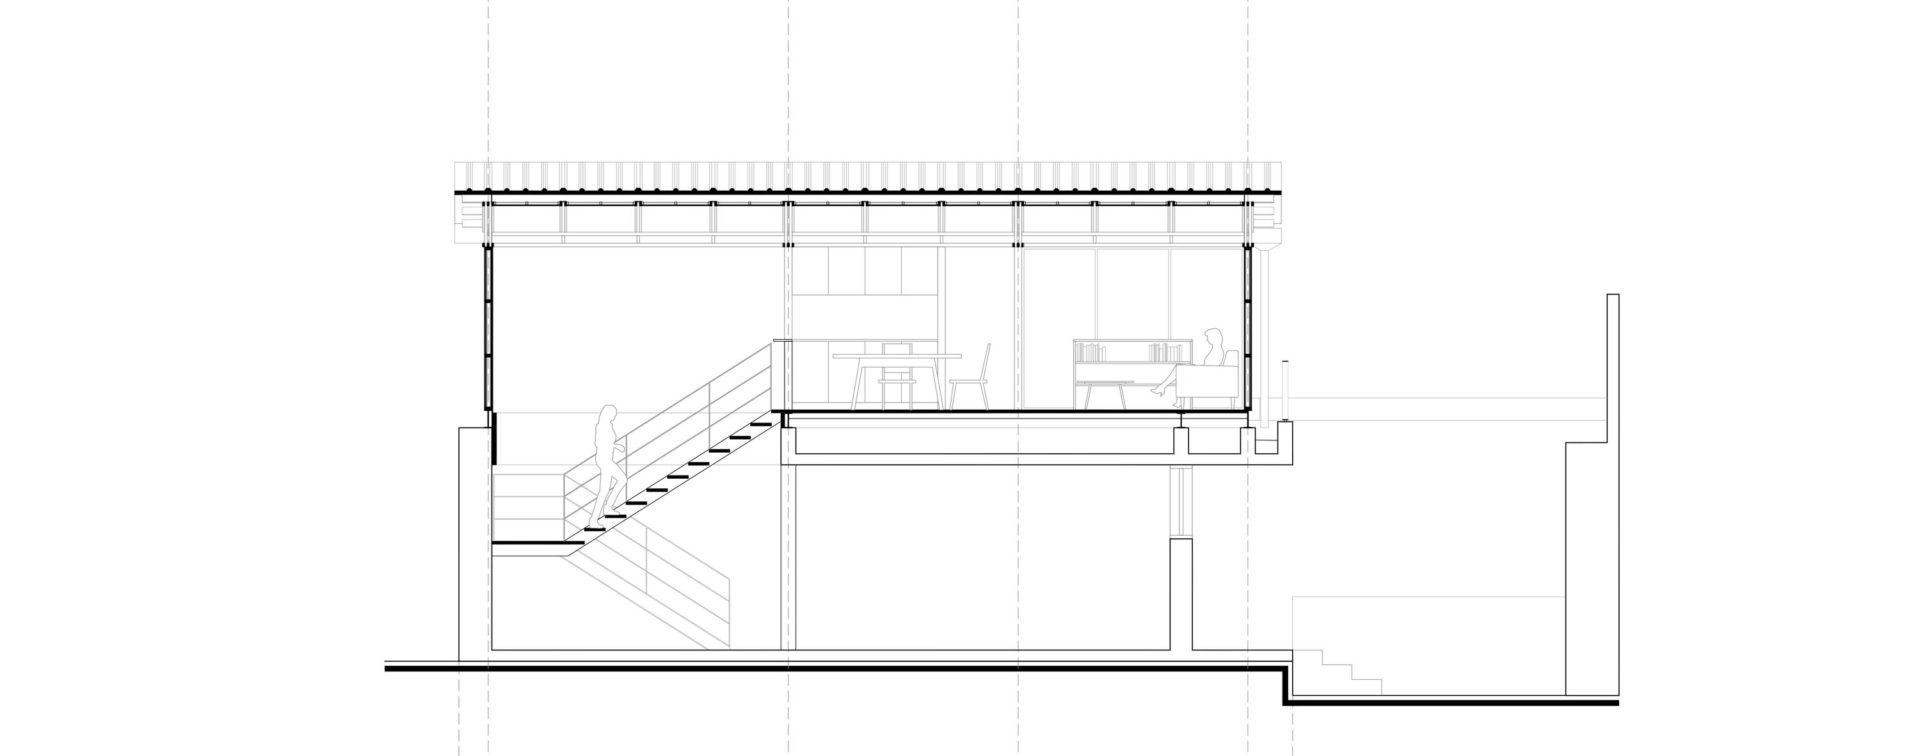 /Users/Ana/Documents/Proyectos/04_Casa Cascada/Proyecto/Presenta